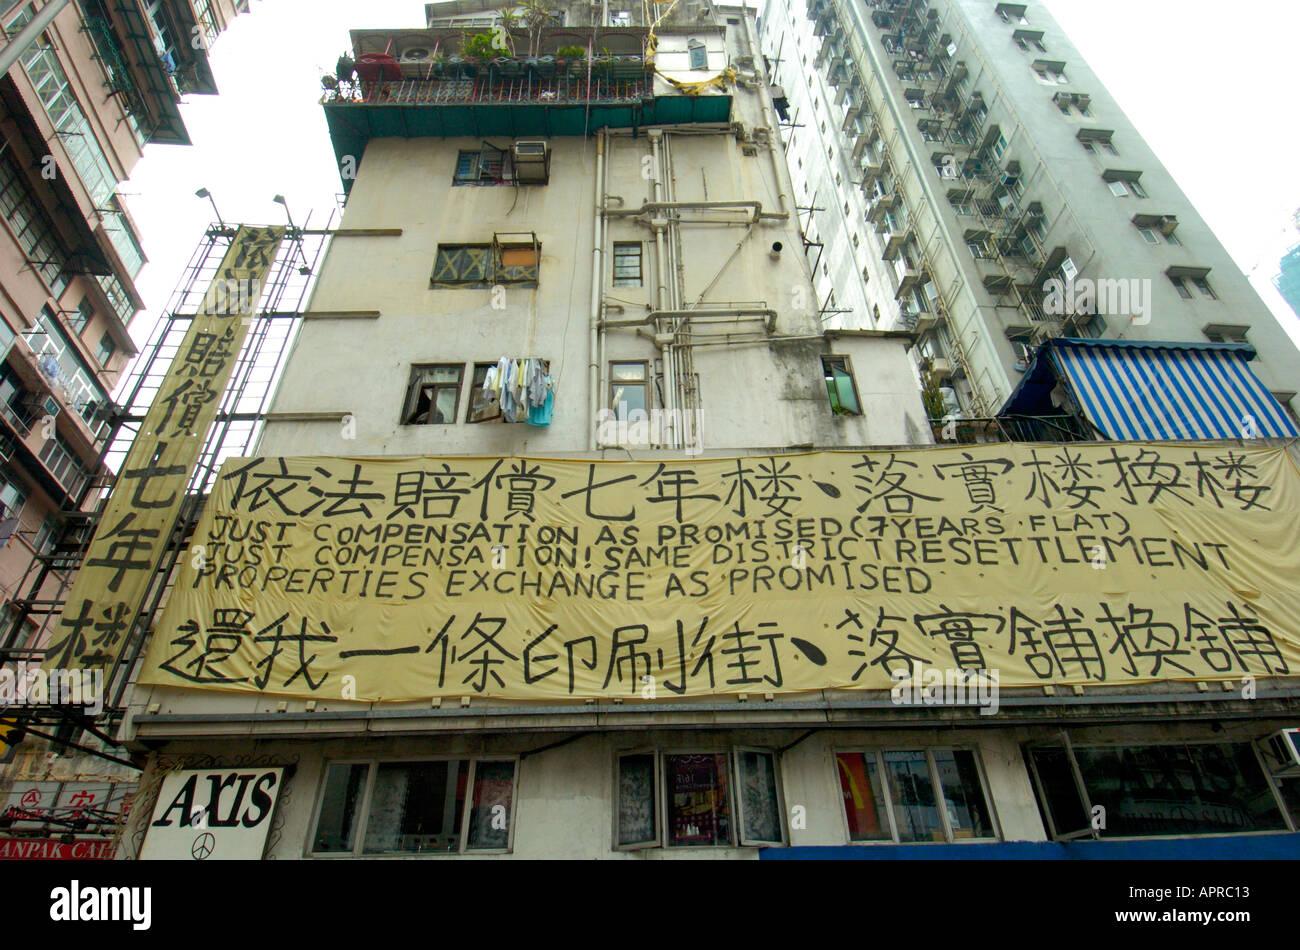 Architecture of Hong Kong